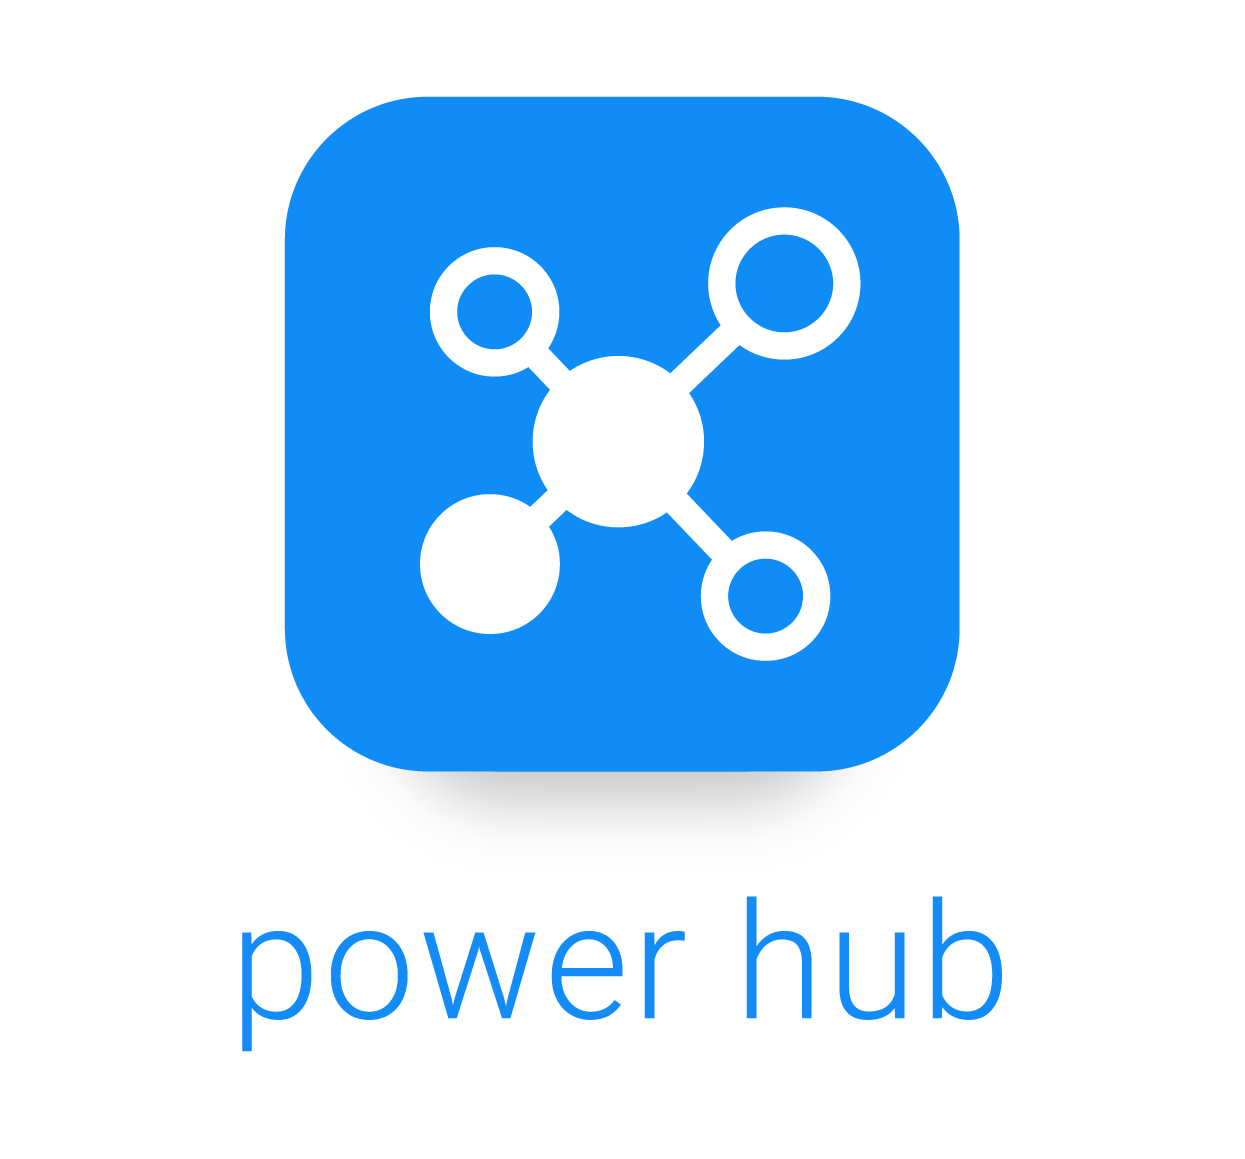 power hub logo